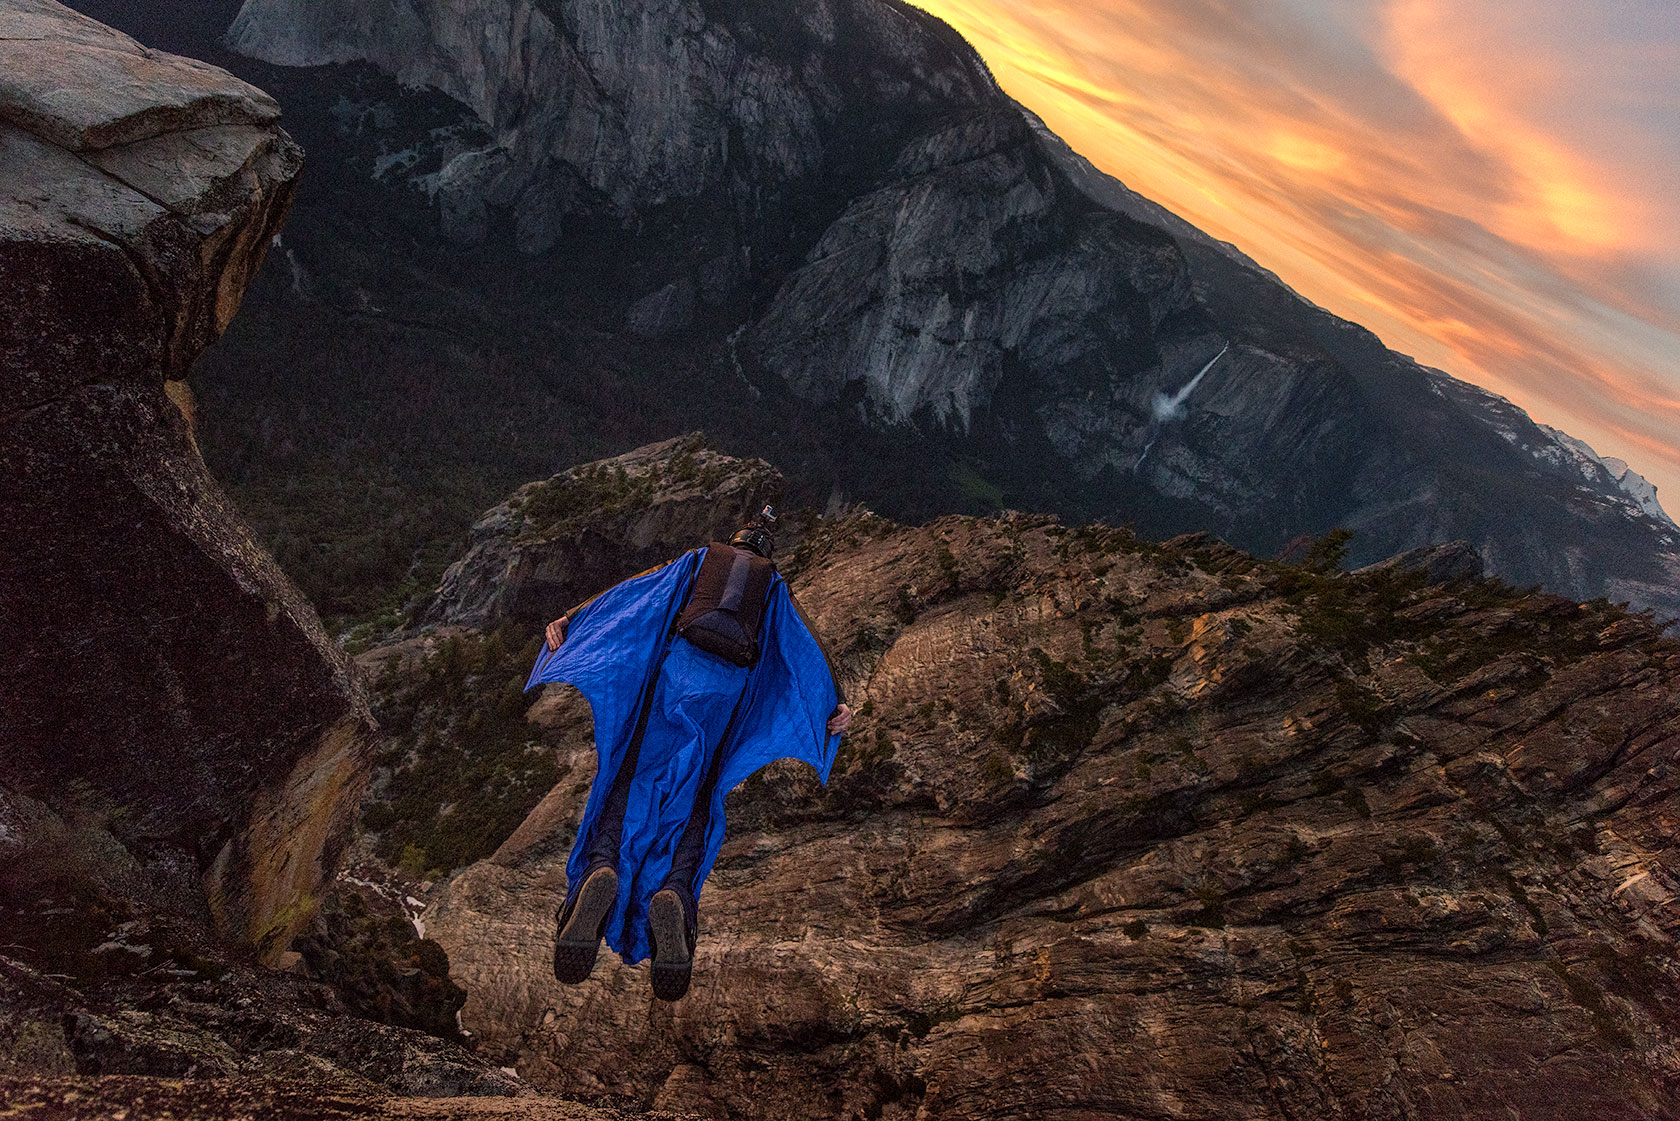 austin-trigg-wing-suit-base-jump-fly-yosemite-lifestyle-california-adventure-thrill-seeking-sunset-waterfall-taft-point-jump.jpg